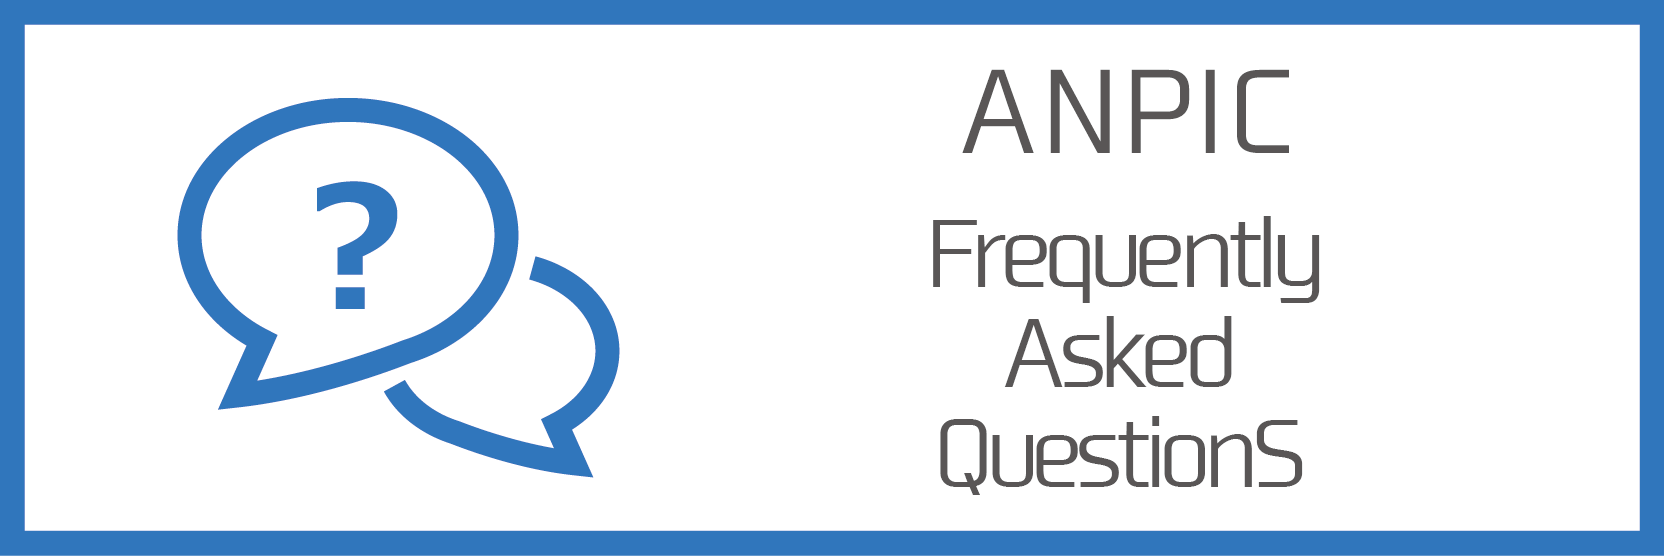 ANPIC_QA_en_3-01